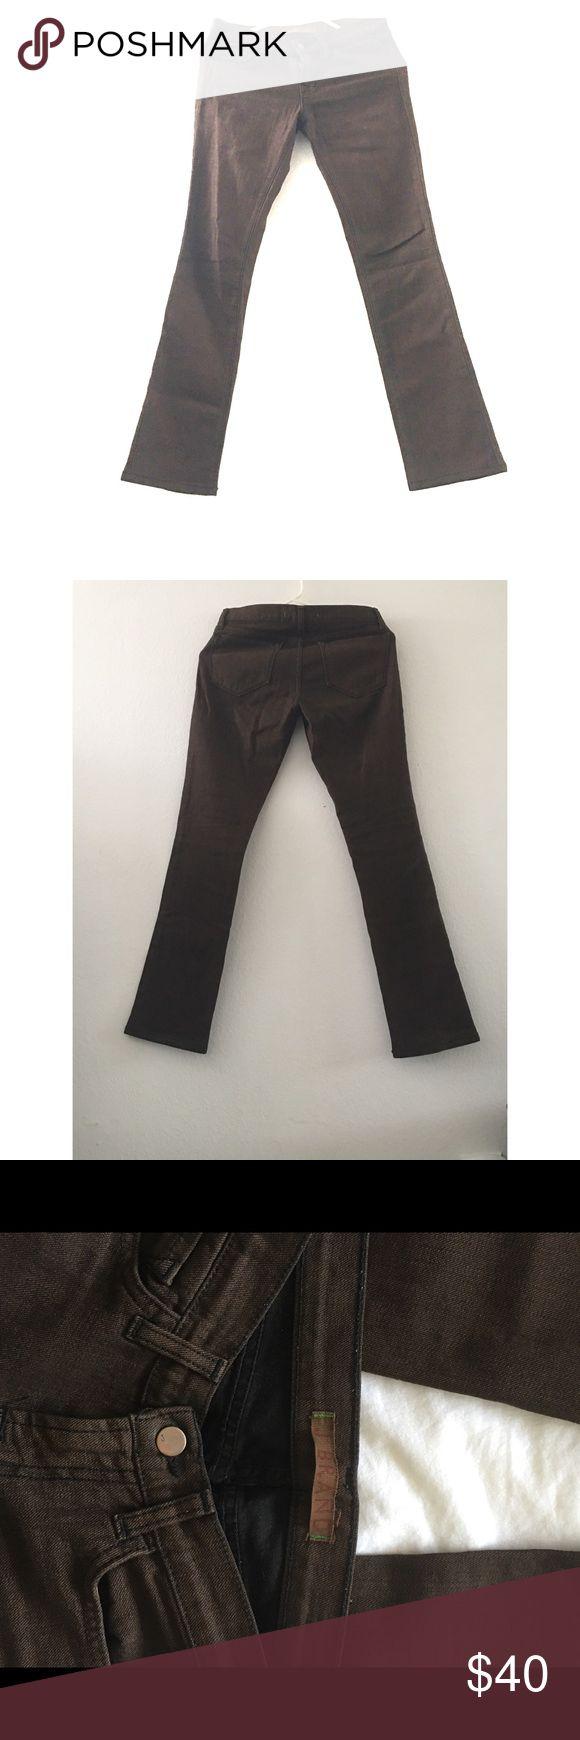 J Brand Dark Brown Skinny Jeans Dark brown skinny jeans- J Brand. Size 25 99%cotton 1%spandex, skinny jean, almost new J Brand Jeans Boot Cut